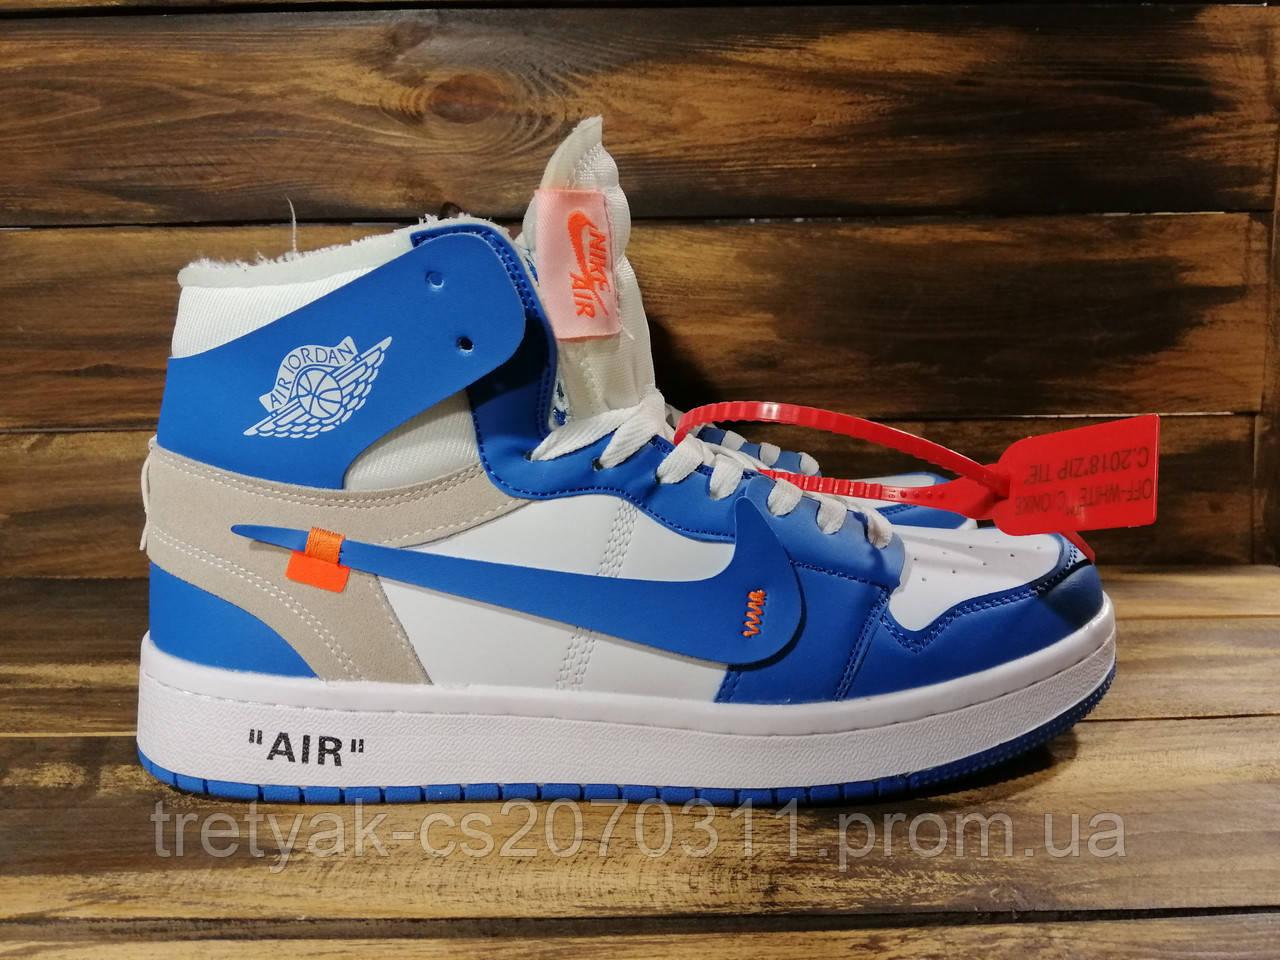 2d81ce75 Кроссовки мужские Nike Air Jordan x OFF-White (реплика) 00037 ...